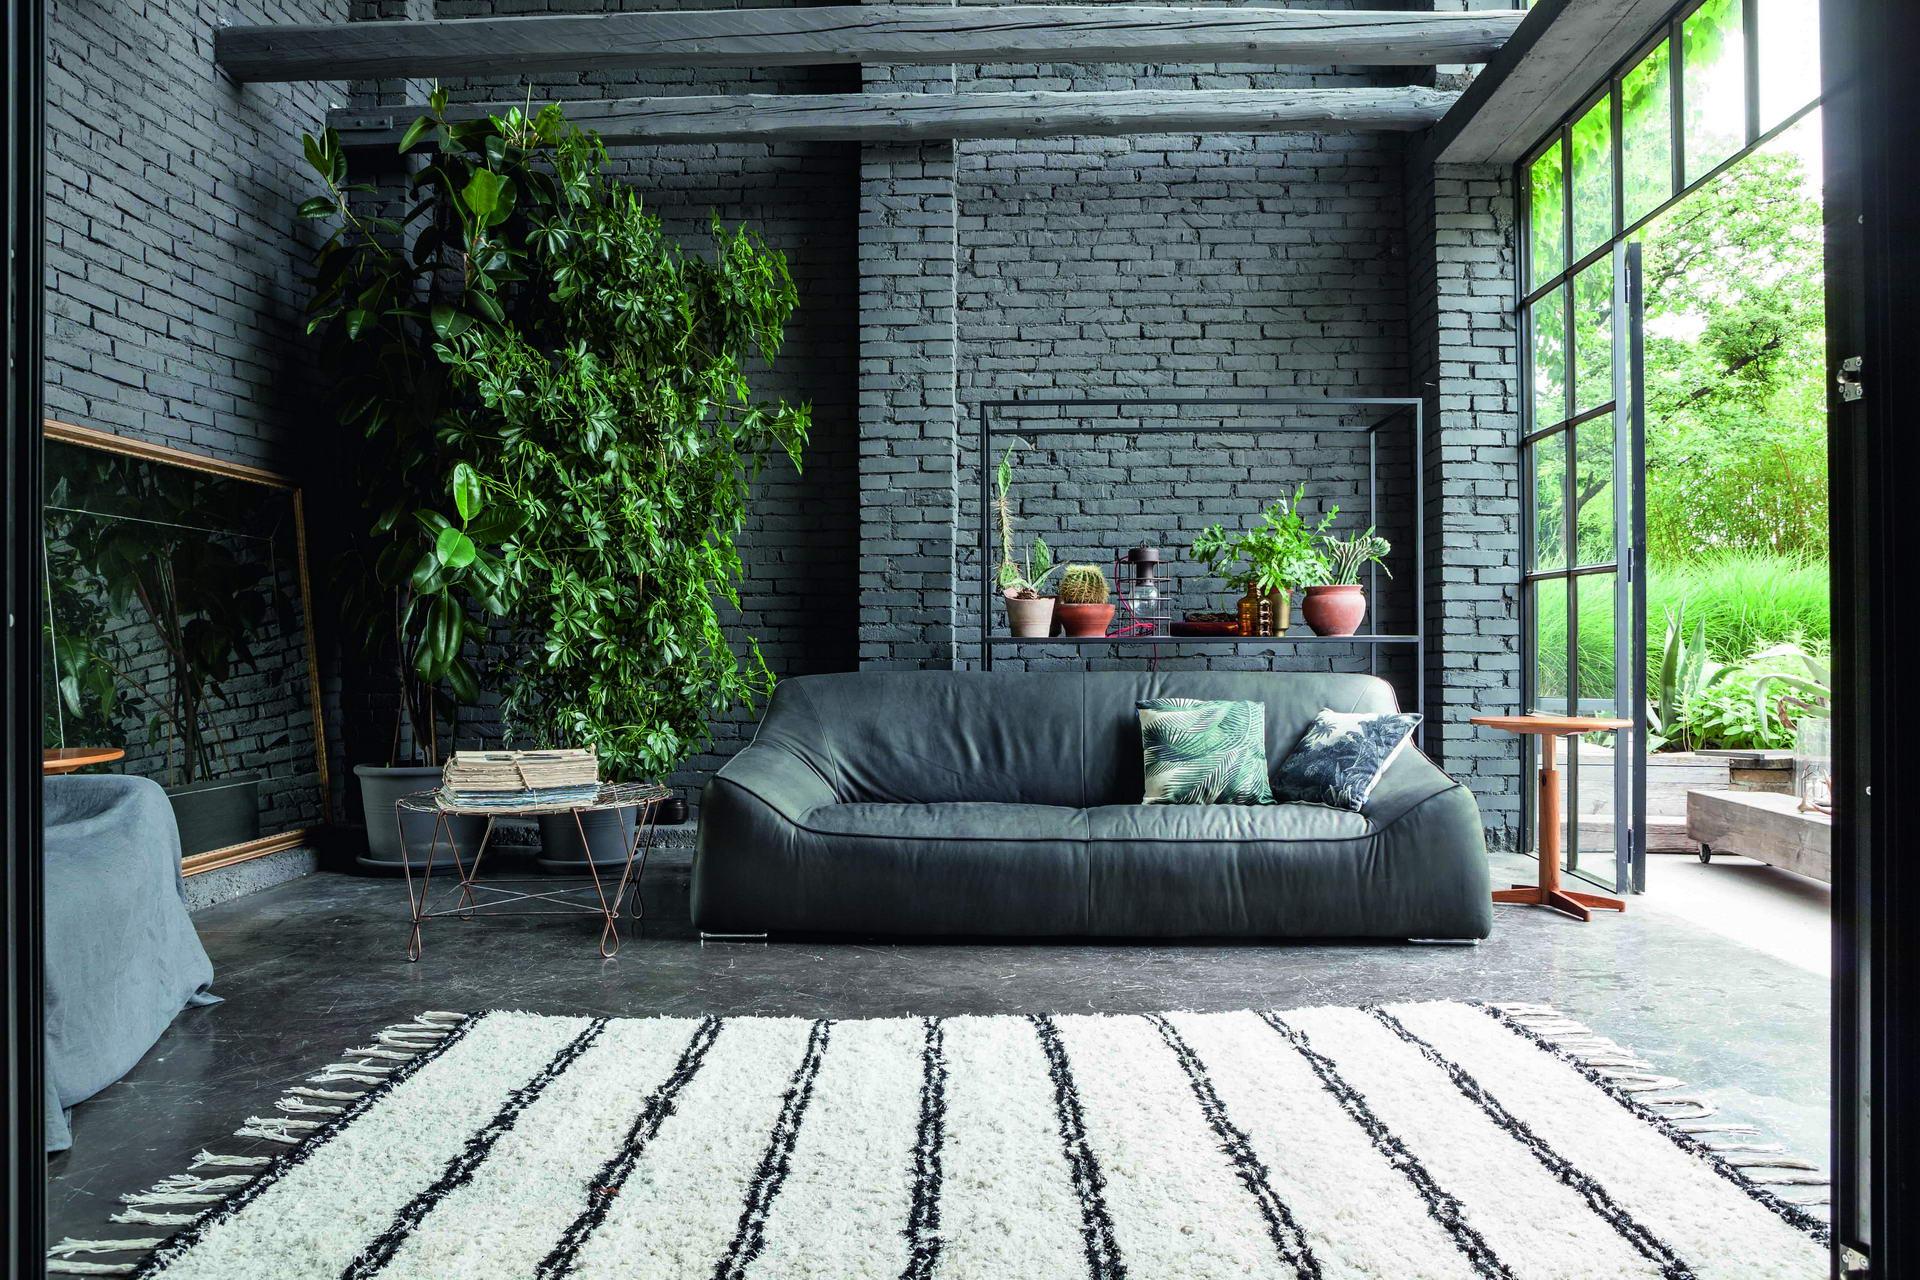 Mueble tapizado clásico en salón